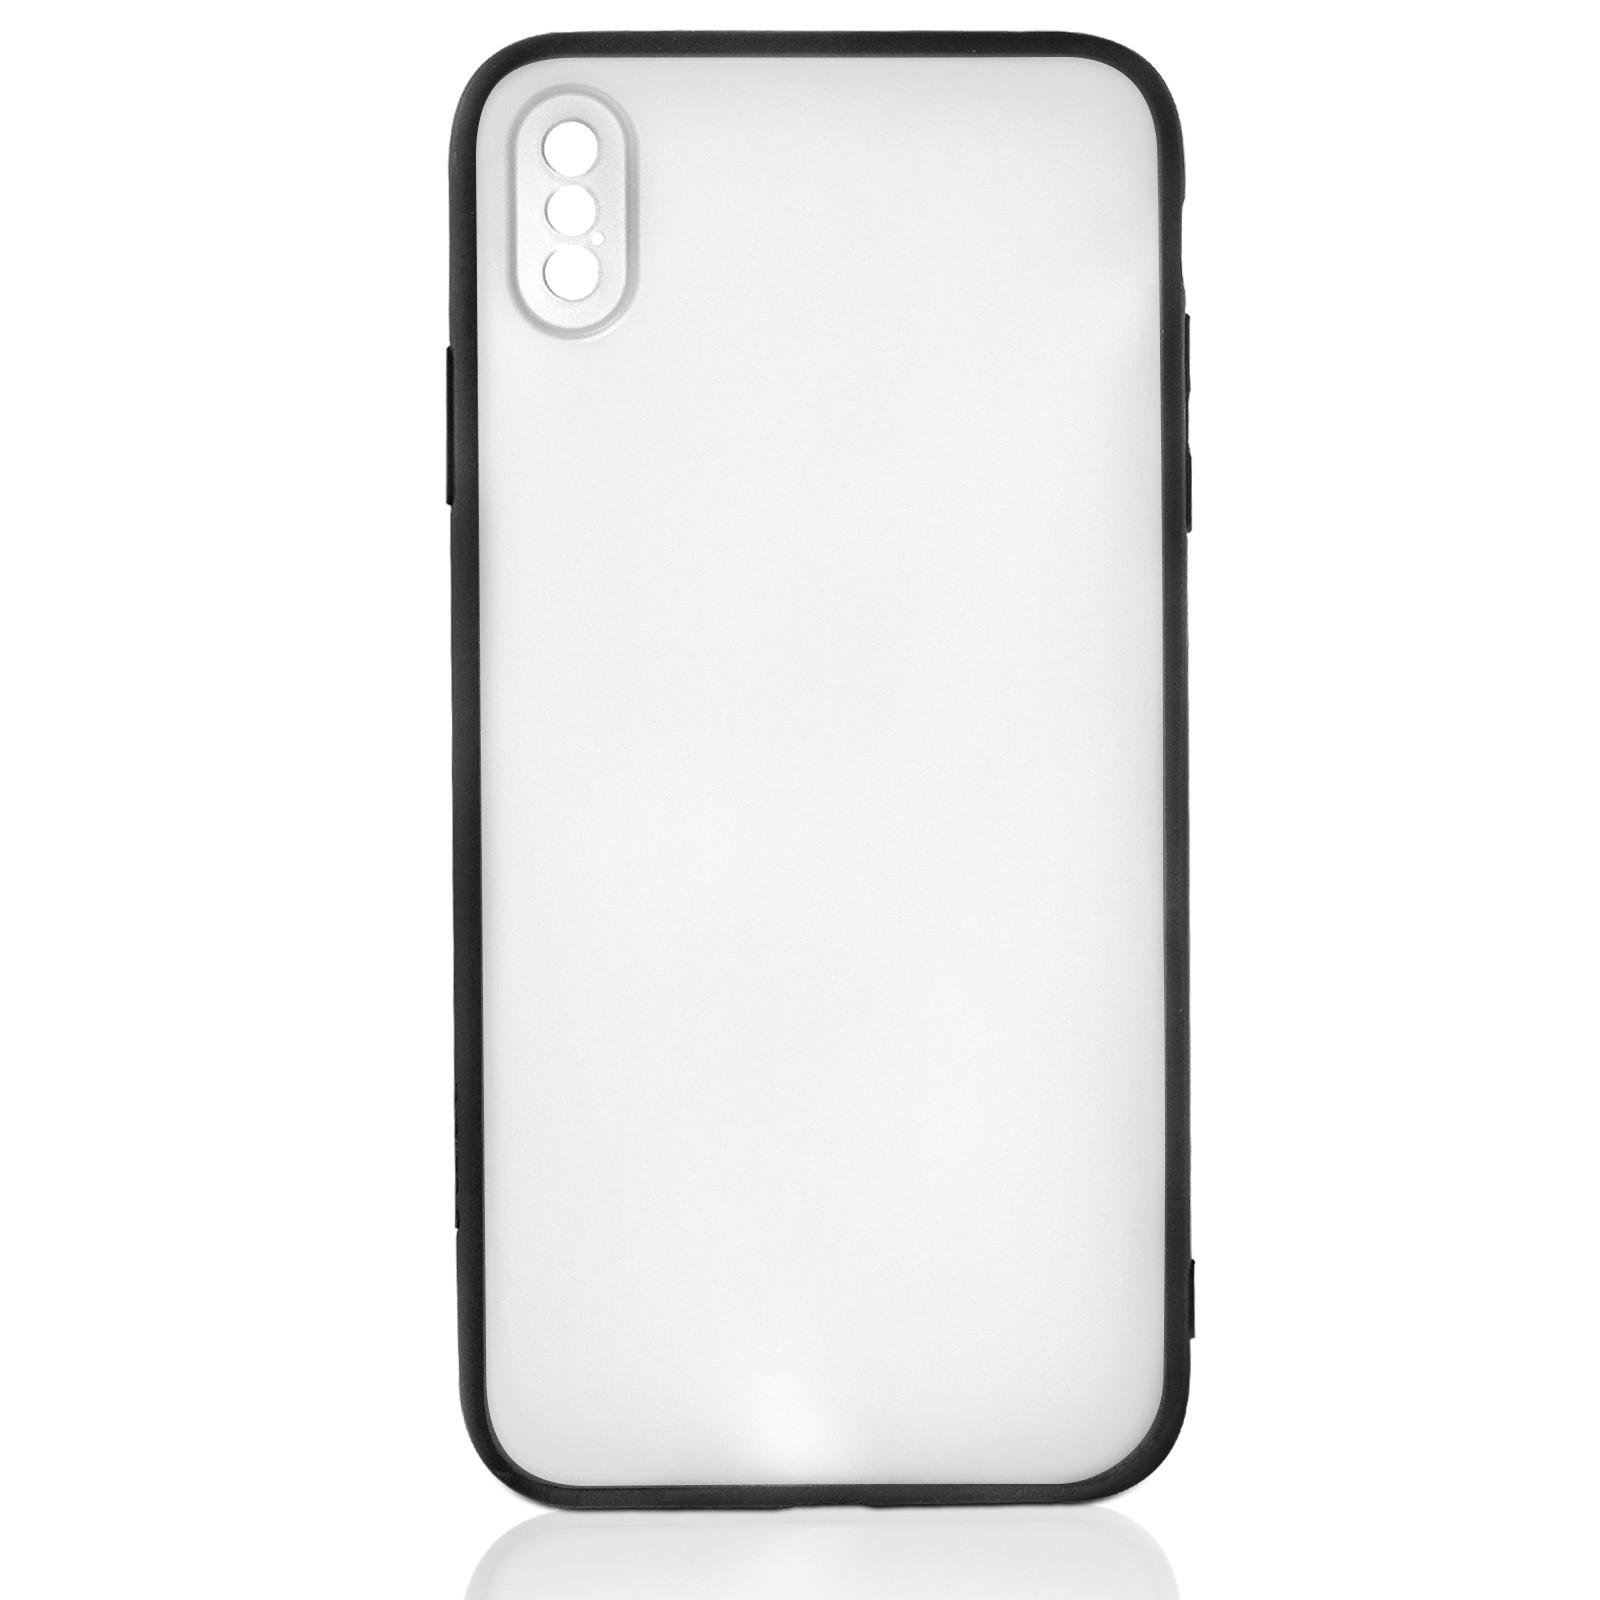 Capac protectie spate cellara colectia shade pentru iphone xs max - negru